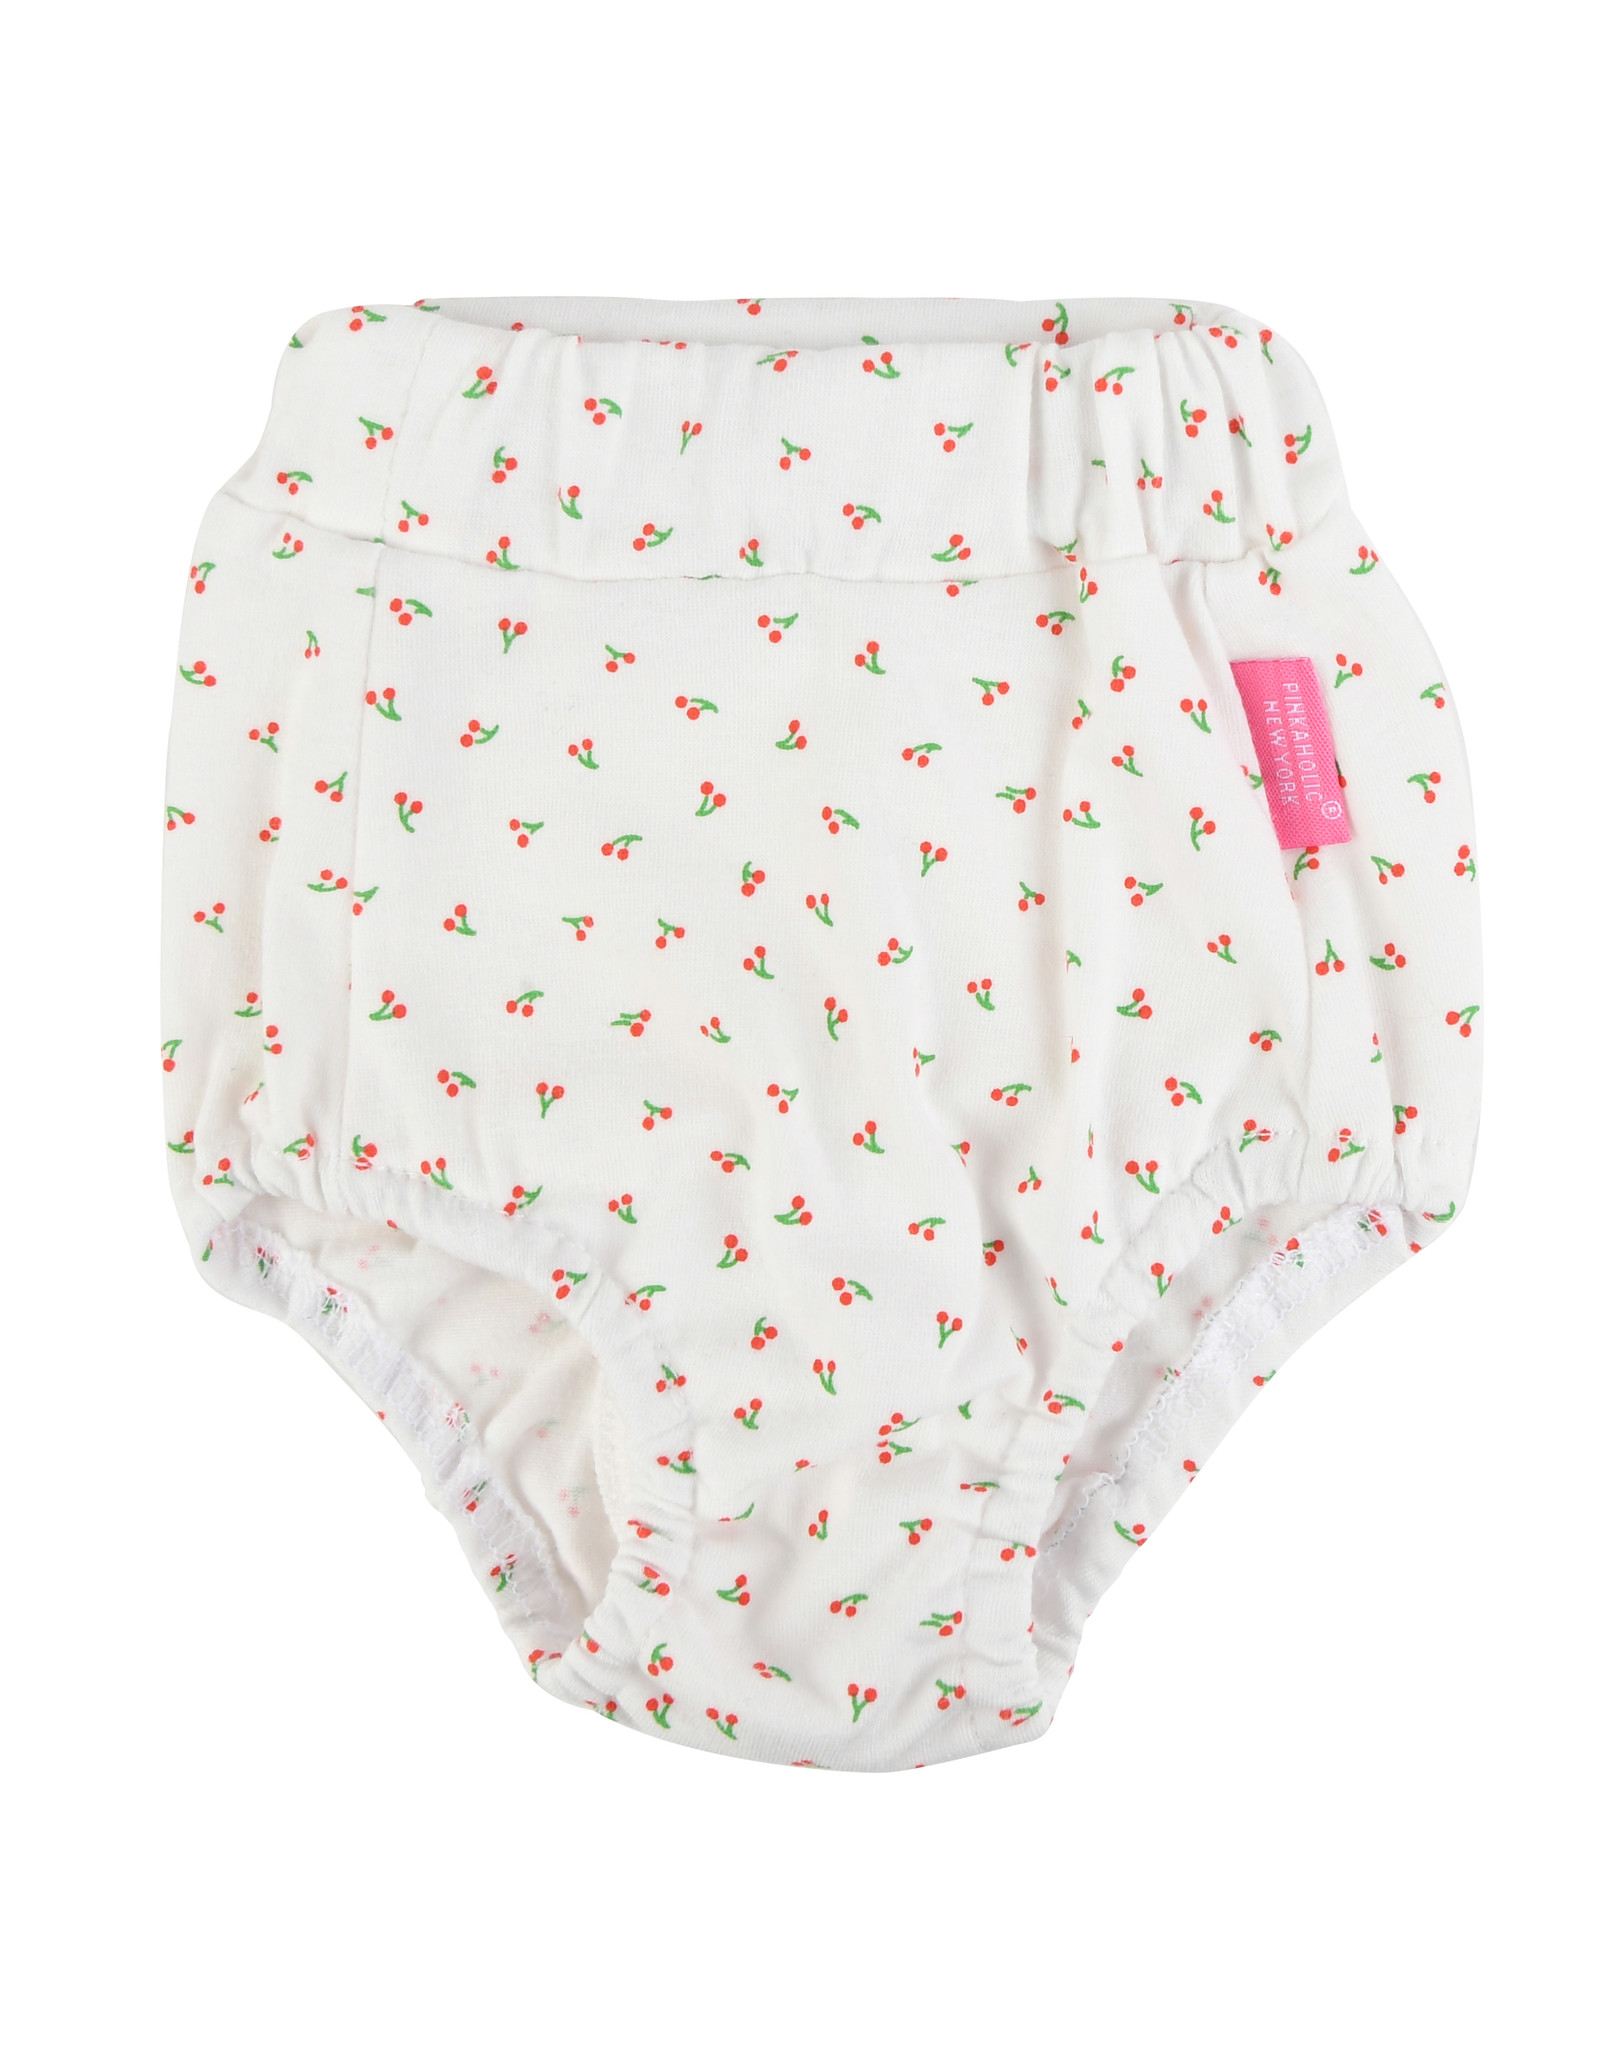 Pinkaholic Pinkaholic Sherie Sanitary panty Ivory